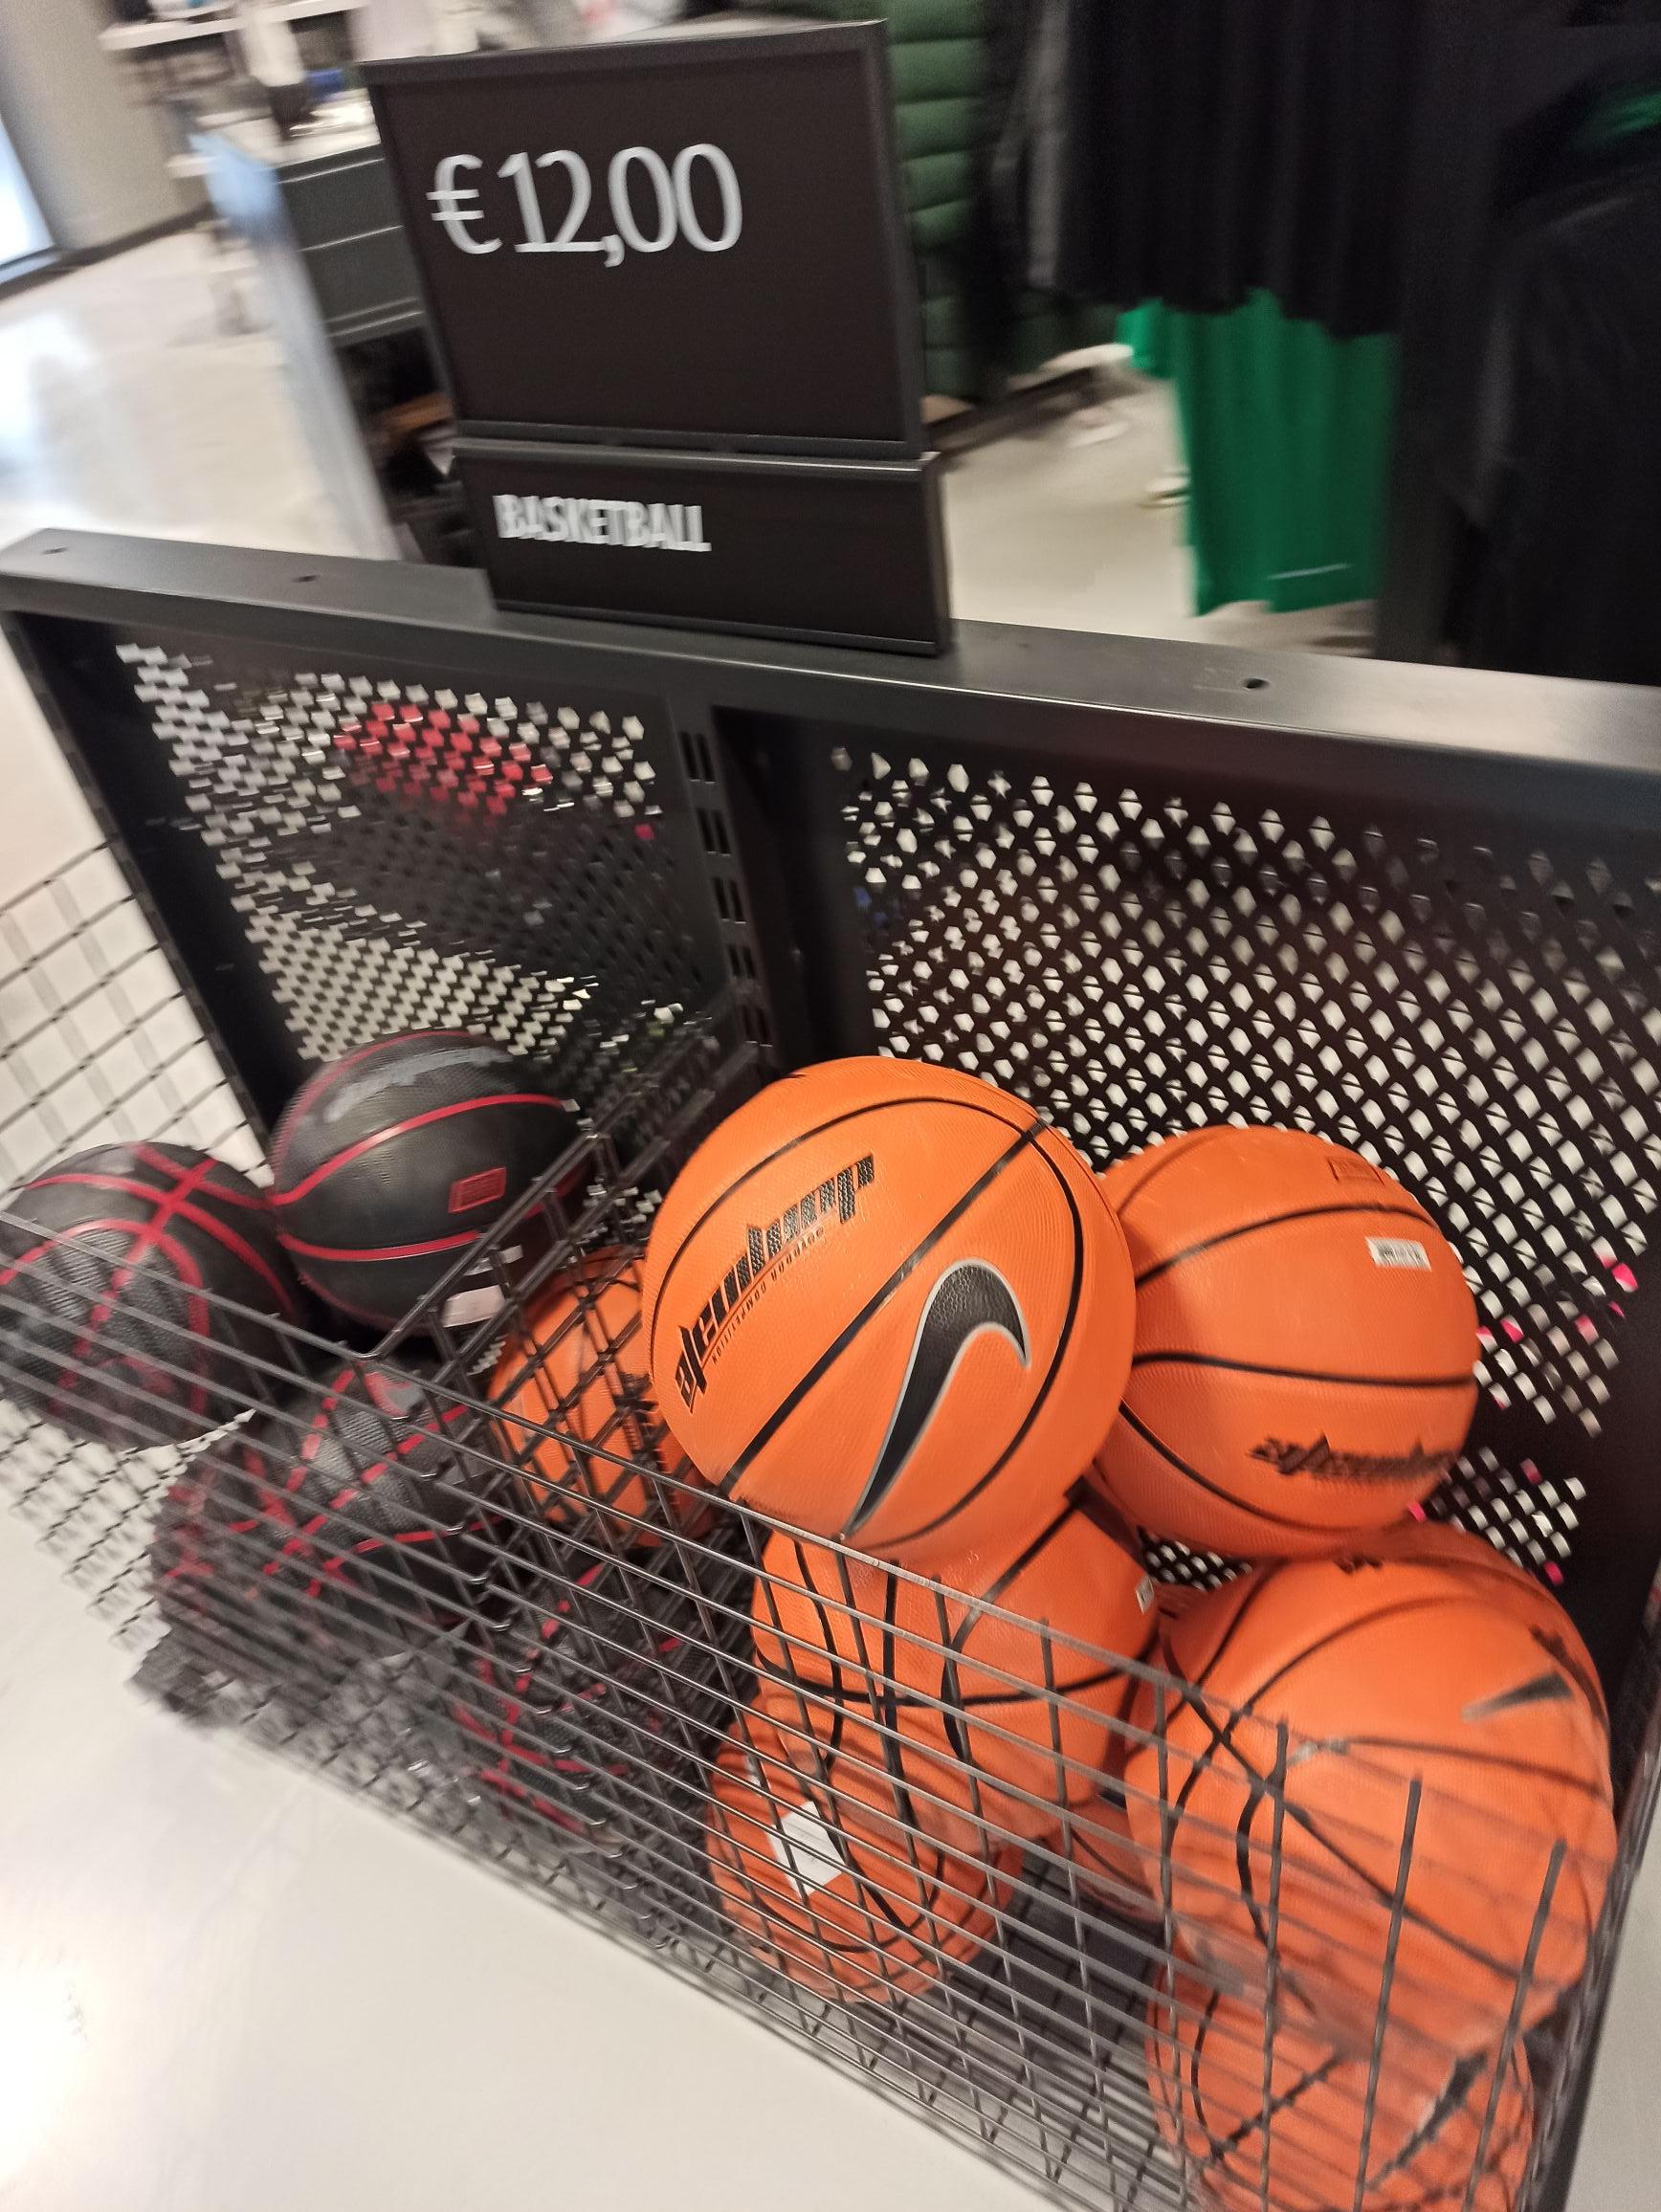 Balón baloncesto nike (Las Rozas)